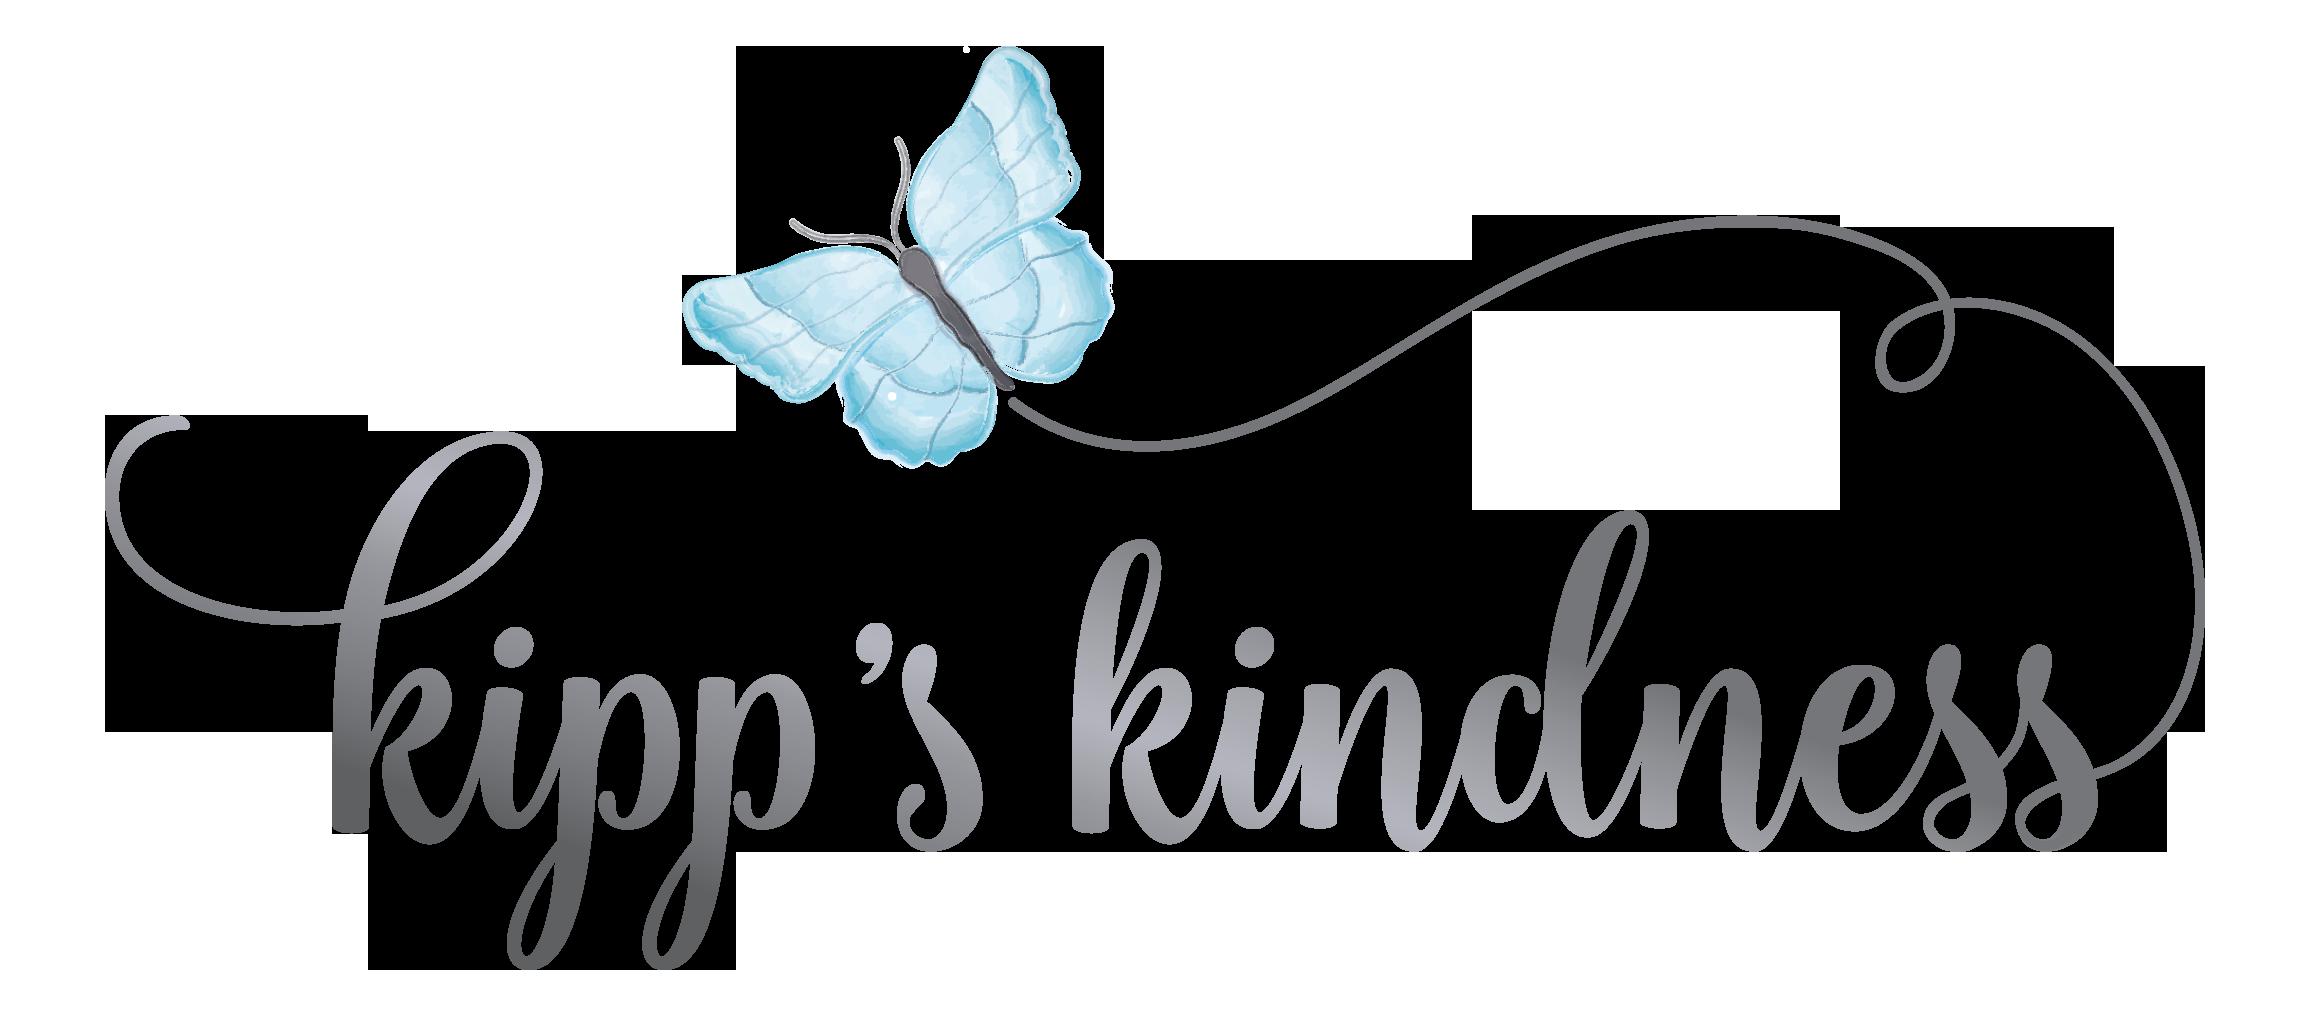 Kindness clipart kind action. Kipp s raising awareness